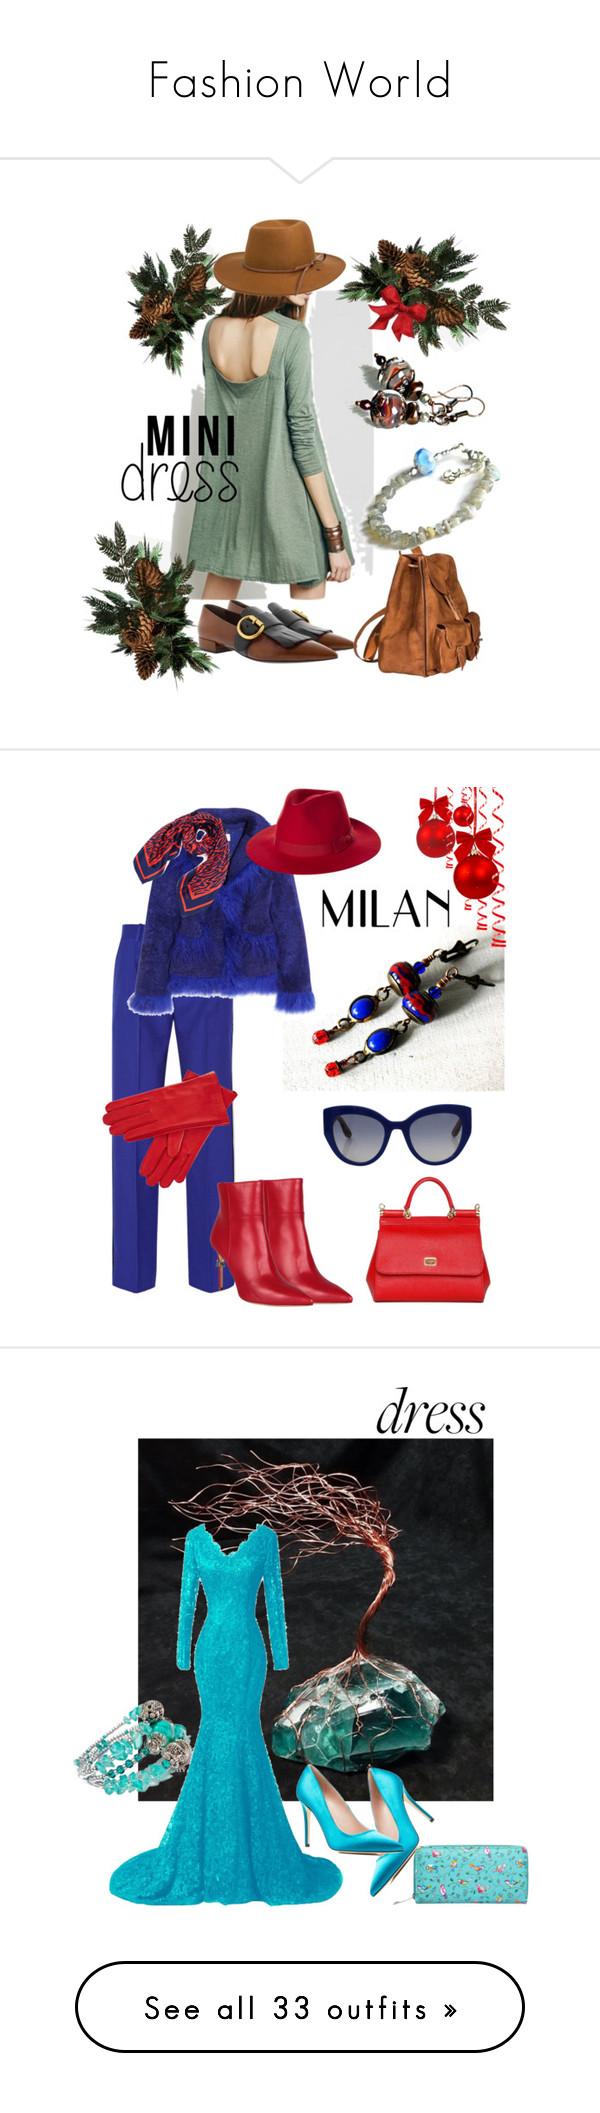 """Fashion World"" by mariannemerceria ❤ liked on Polyvore featuring Prada, Yves Saint Laurent, RHYTHM, boho, minimal, minidress, MarianneMerceria, Jonathan Saunders, Saks Potts and Dsquared2"